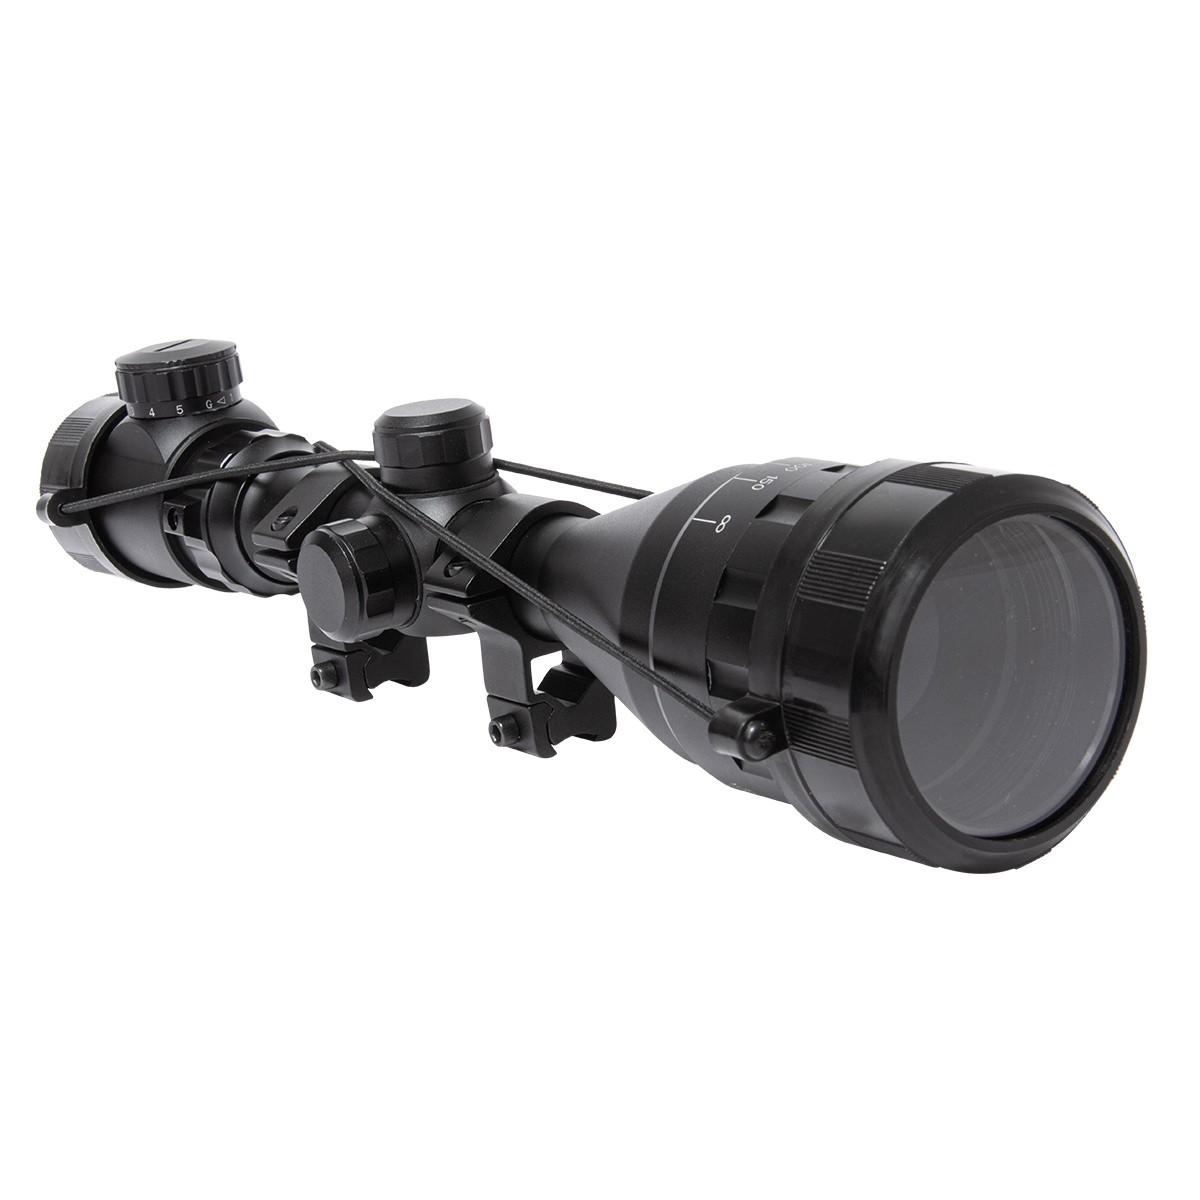 Luneta 4-16x50 AOE Ajuste Parallax Suporte Mount 11mm FXR